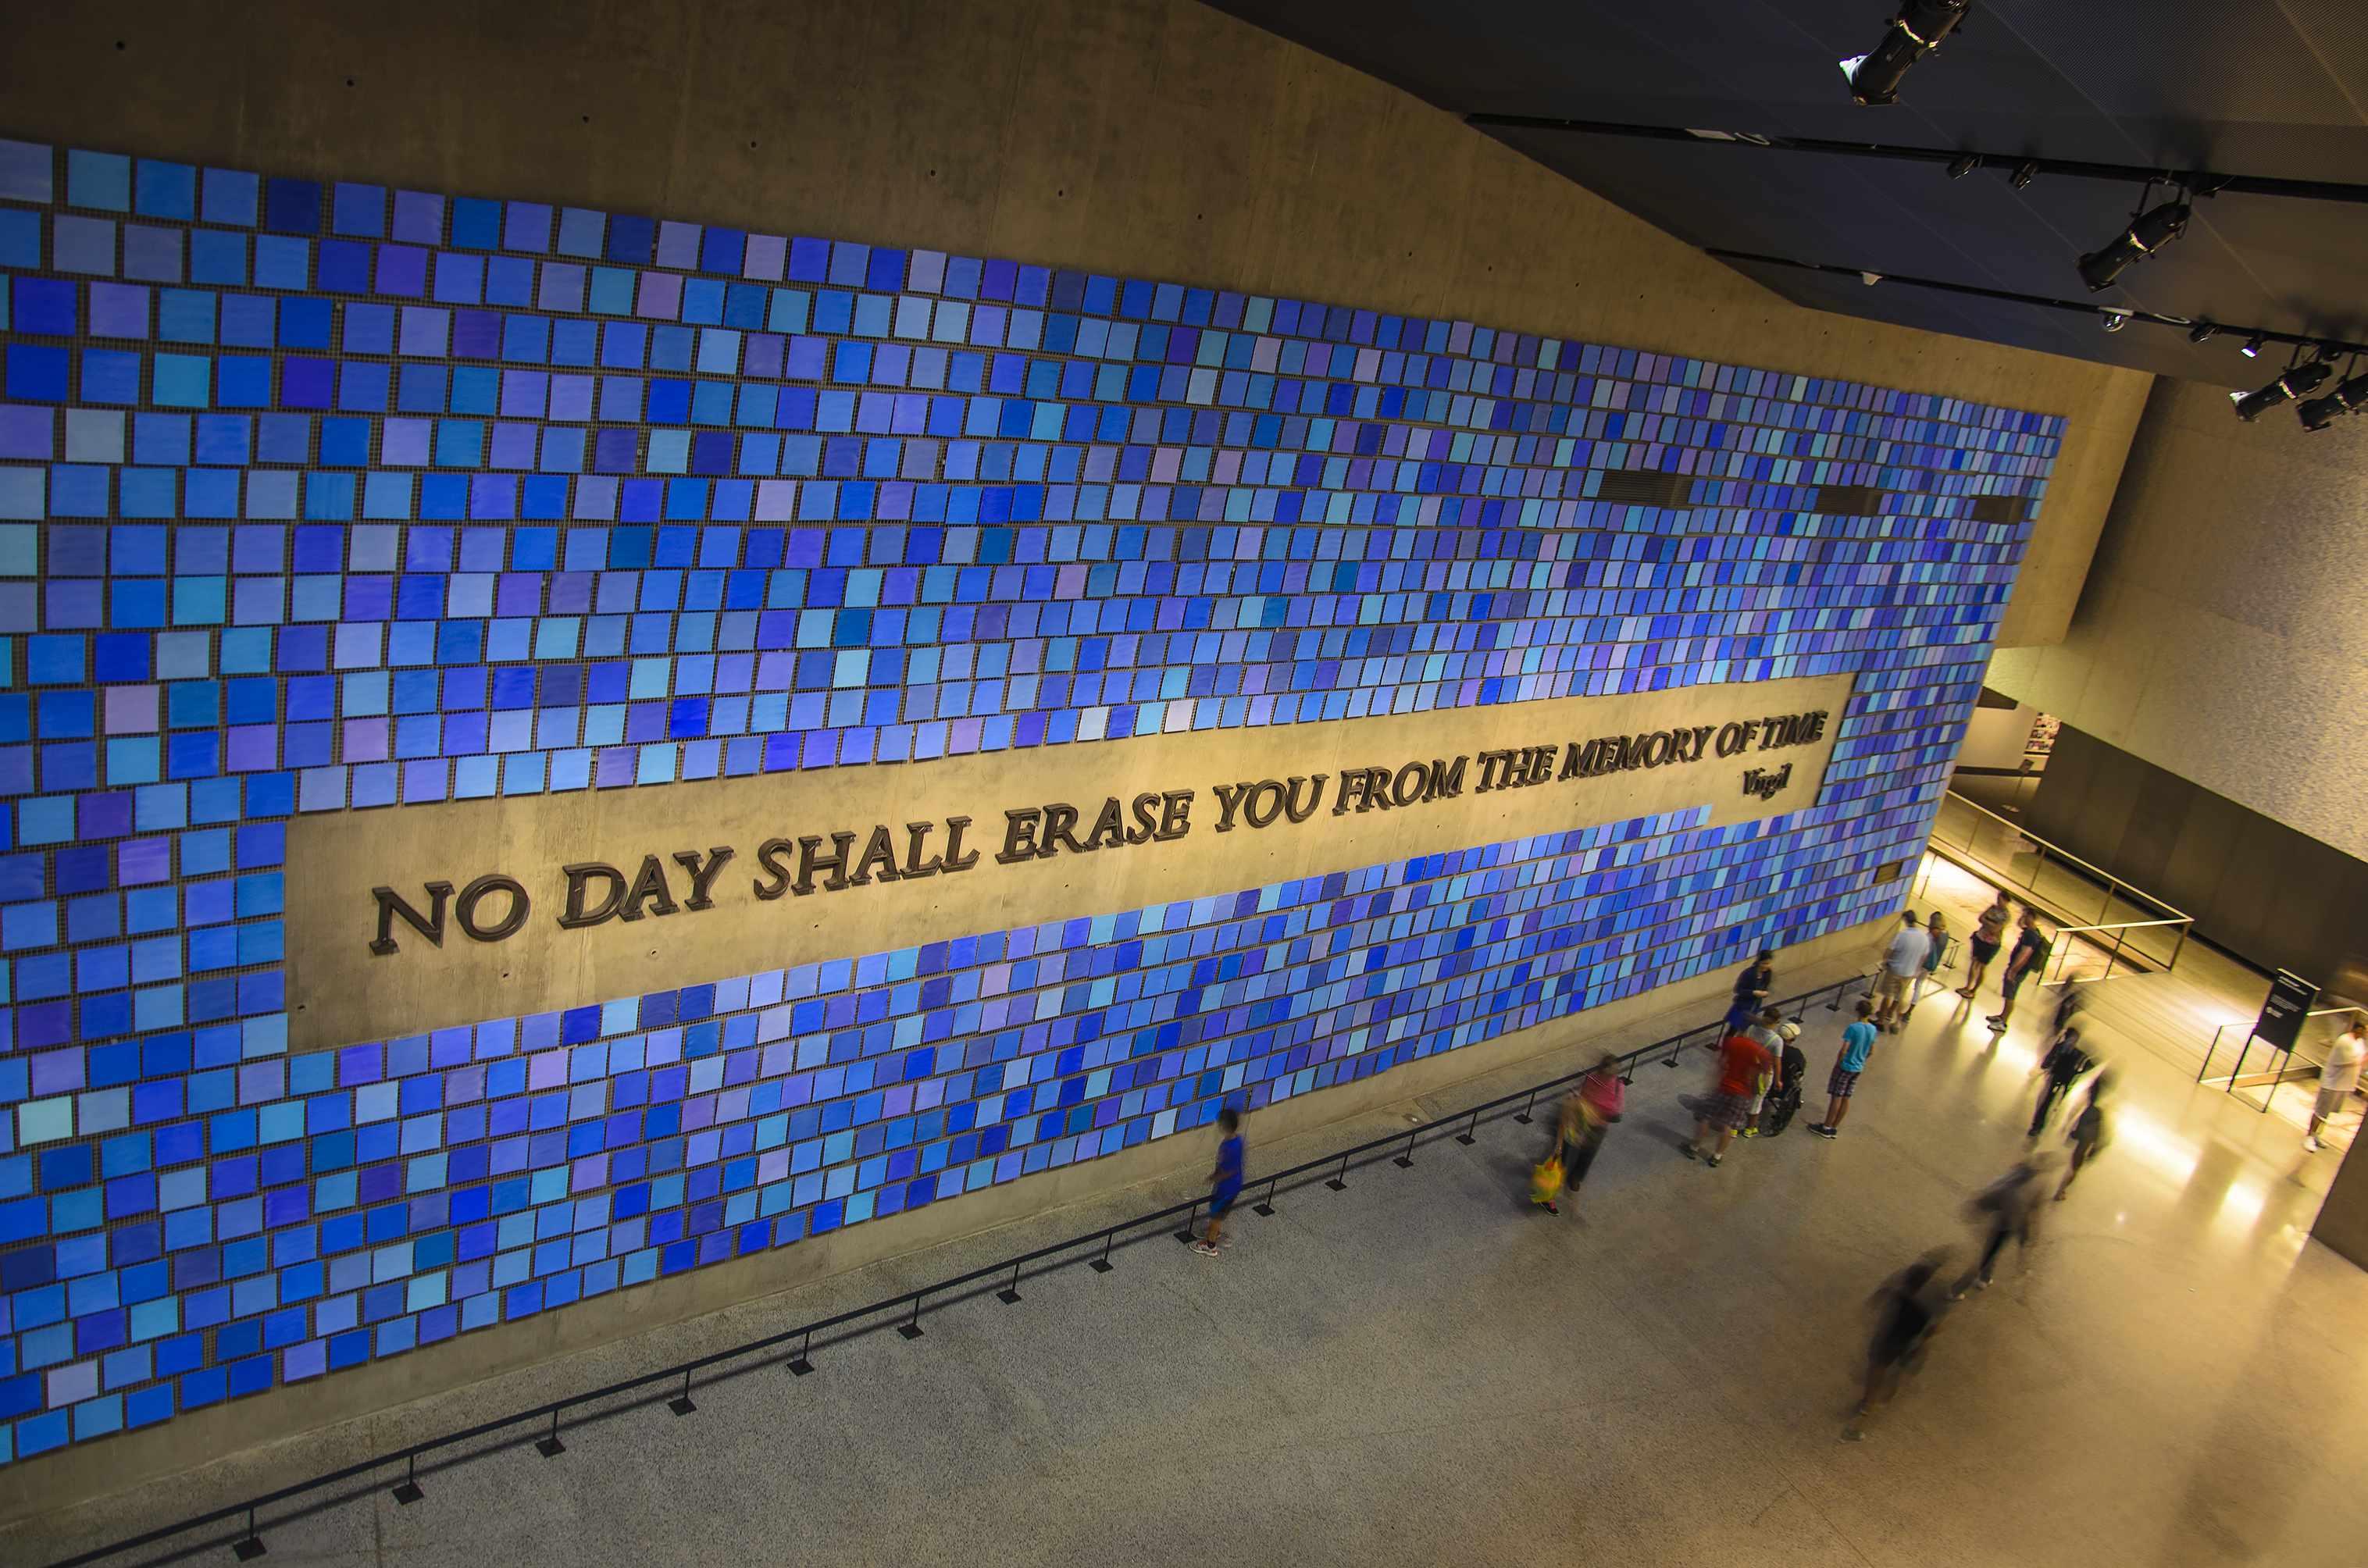 JULY 2016: Interior of the 9/11 Memorial Museum in New York City